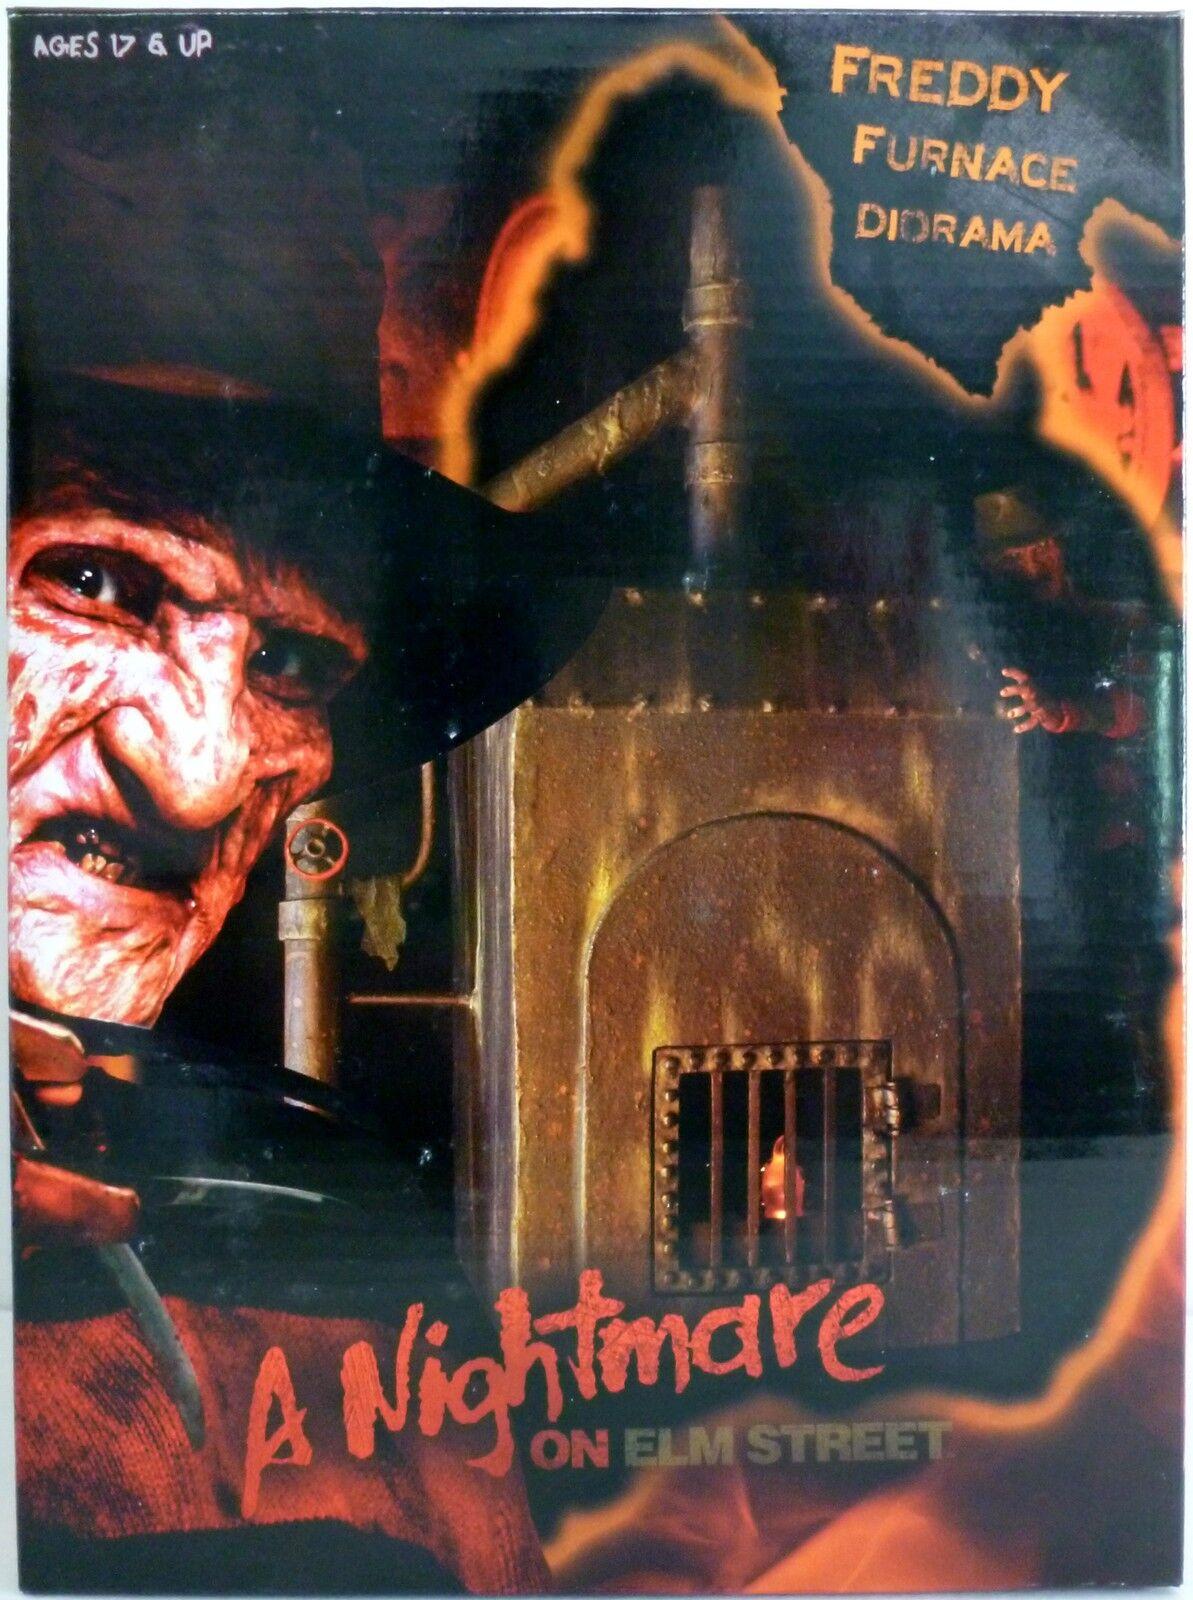 FREDDY FURNACE DIORAMA A Nightmare on Elm Street Movie 7  Scale LED Neca 2018